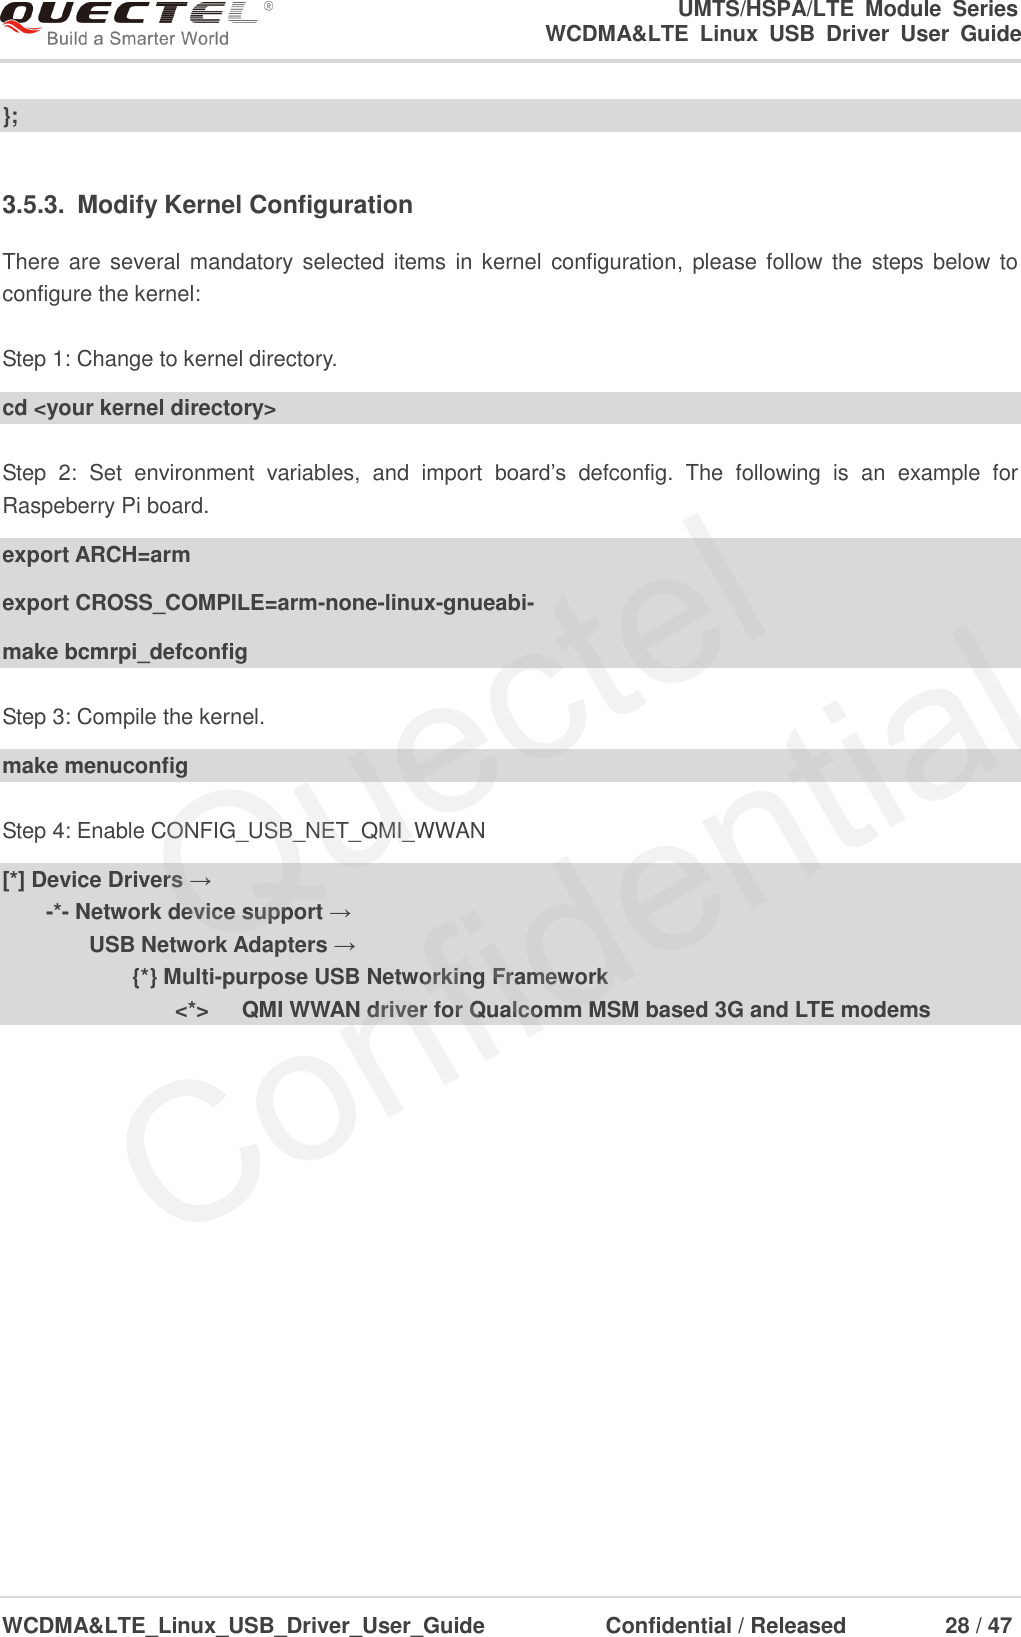 Quectel WCDMA<E Linux USB Driver User Guide V1 8